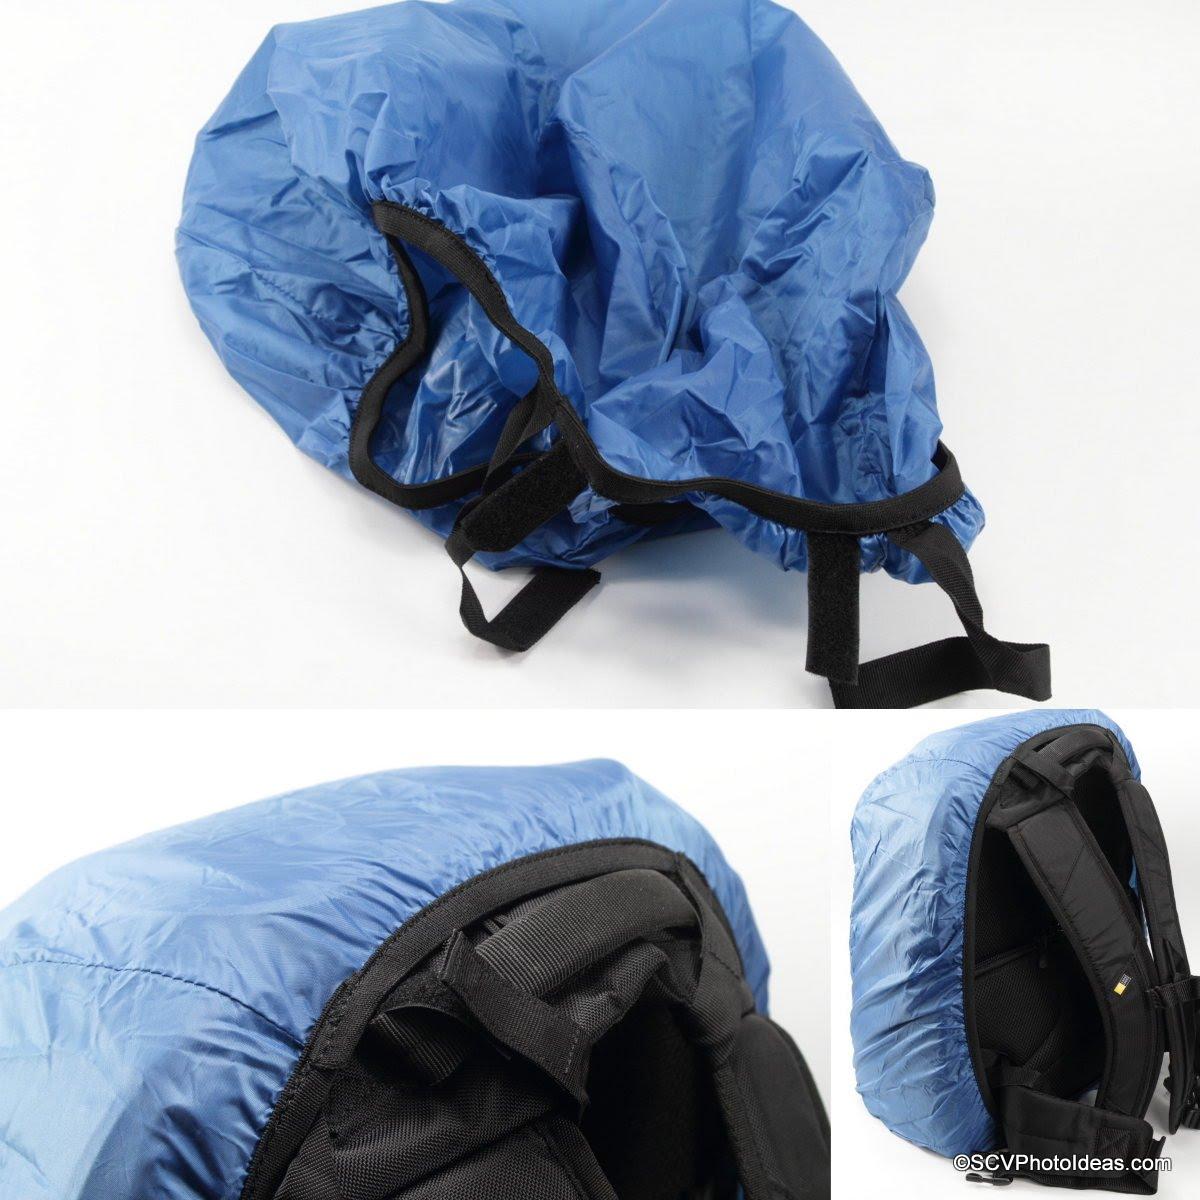 Case Logic DSB-103 rain cover fitting